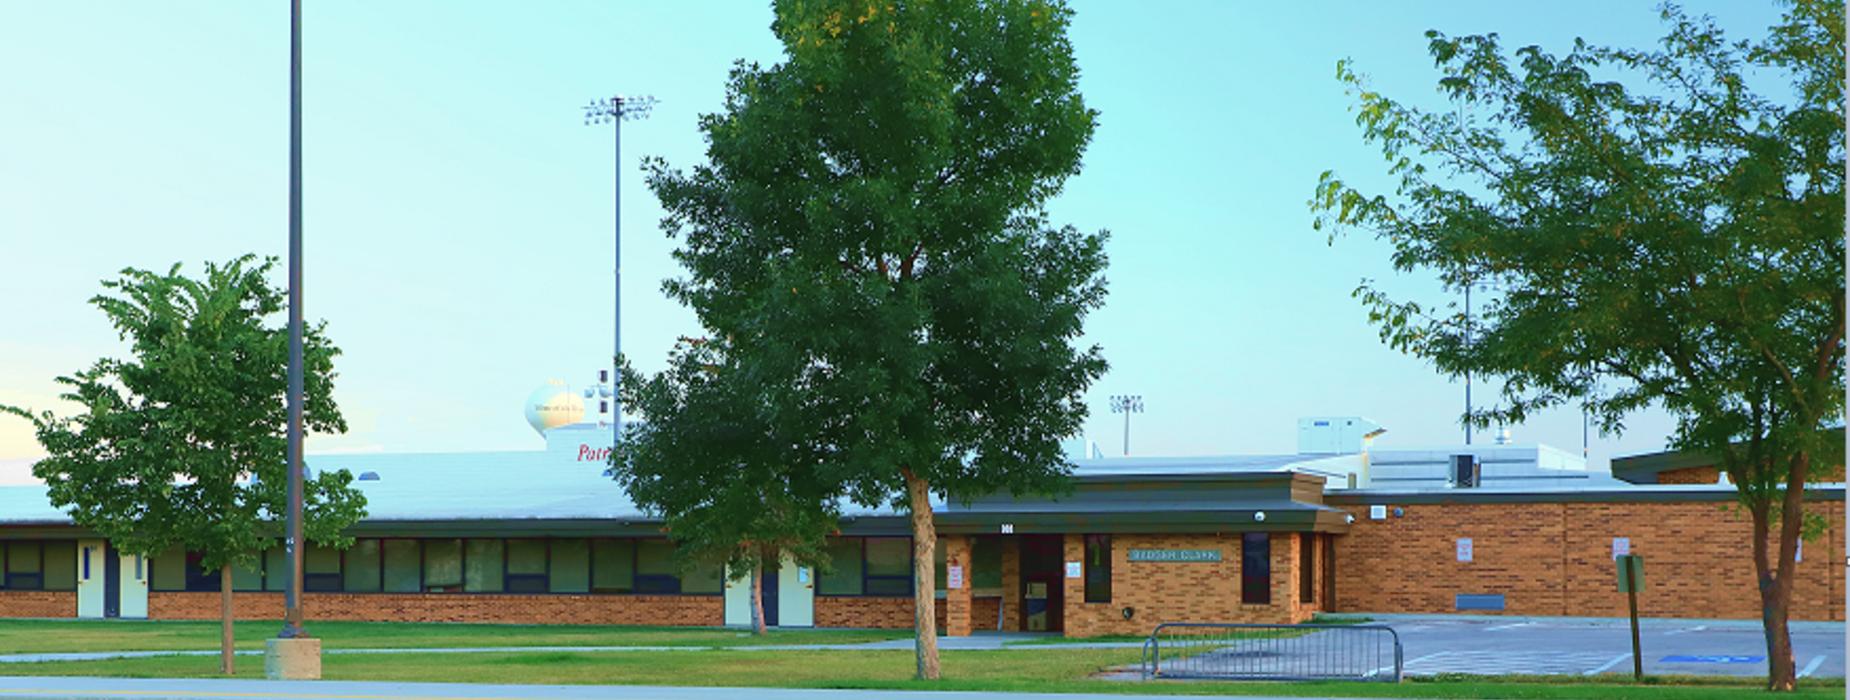 Patriot Elementary Bladger Clark